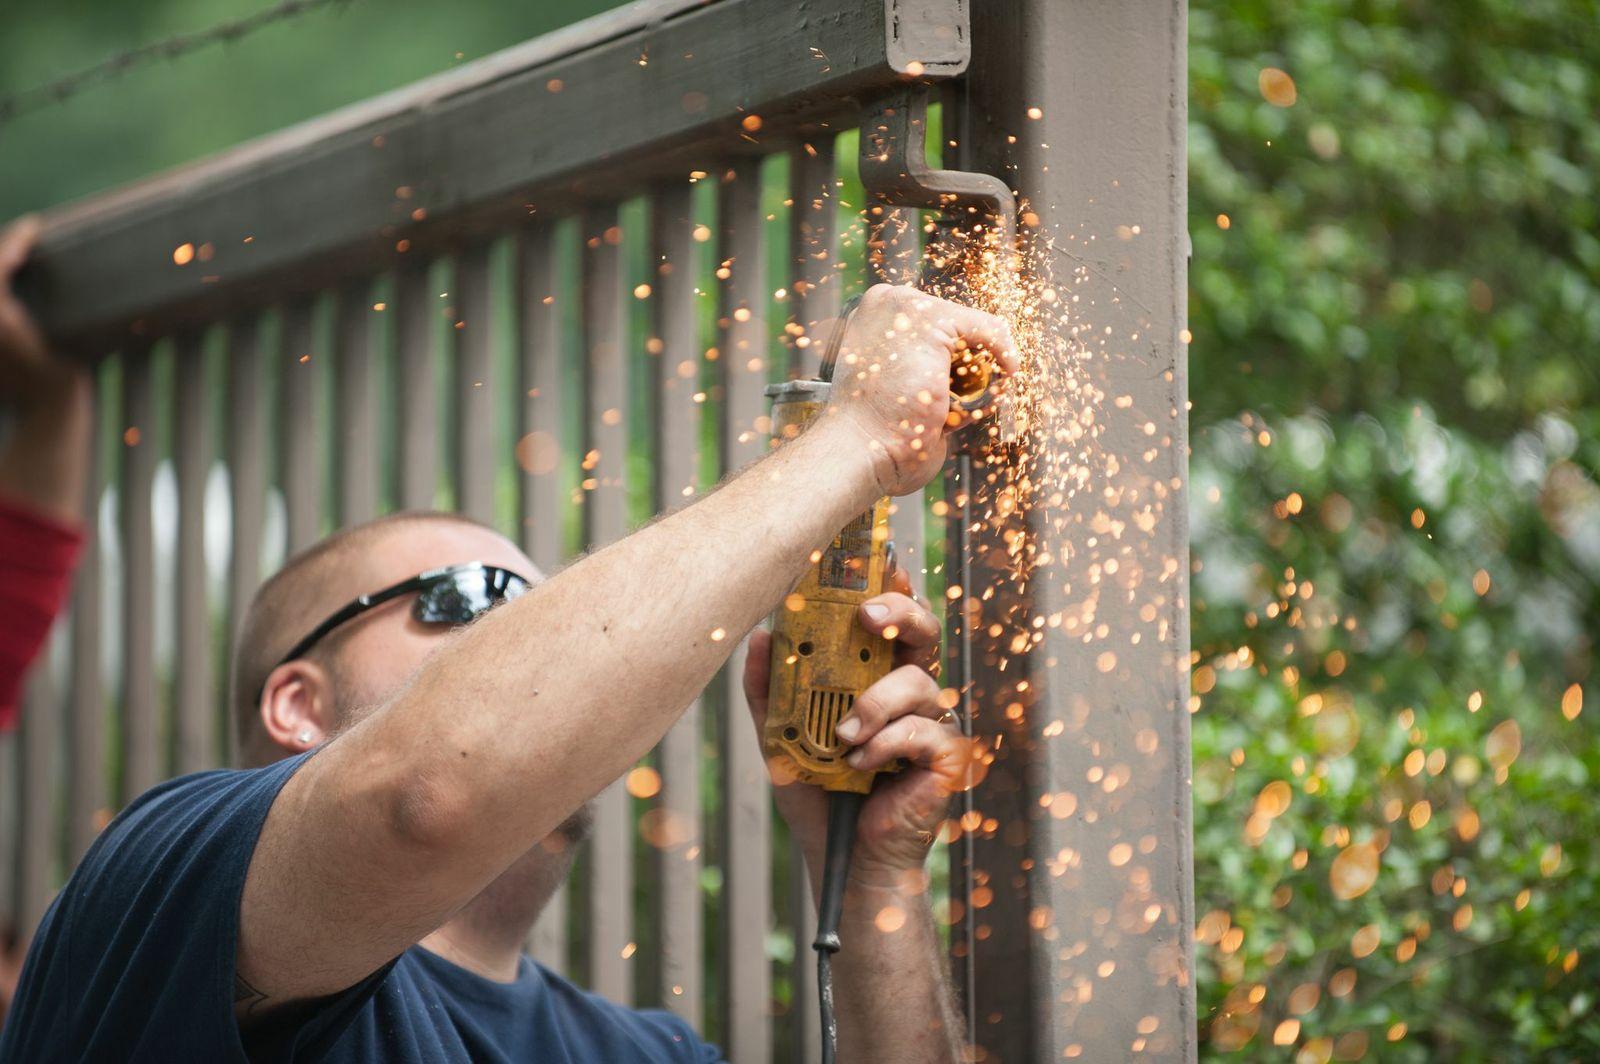 Driveway-gate-installation-and-repair